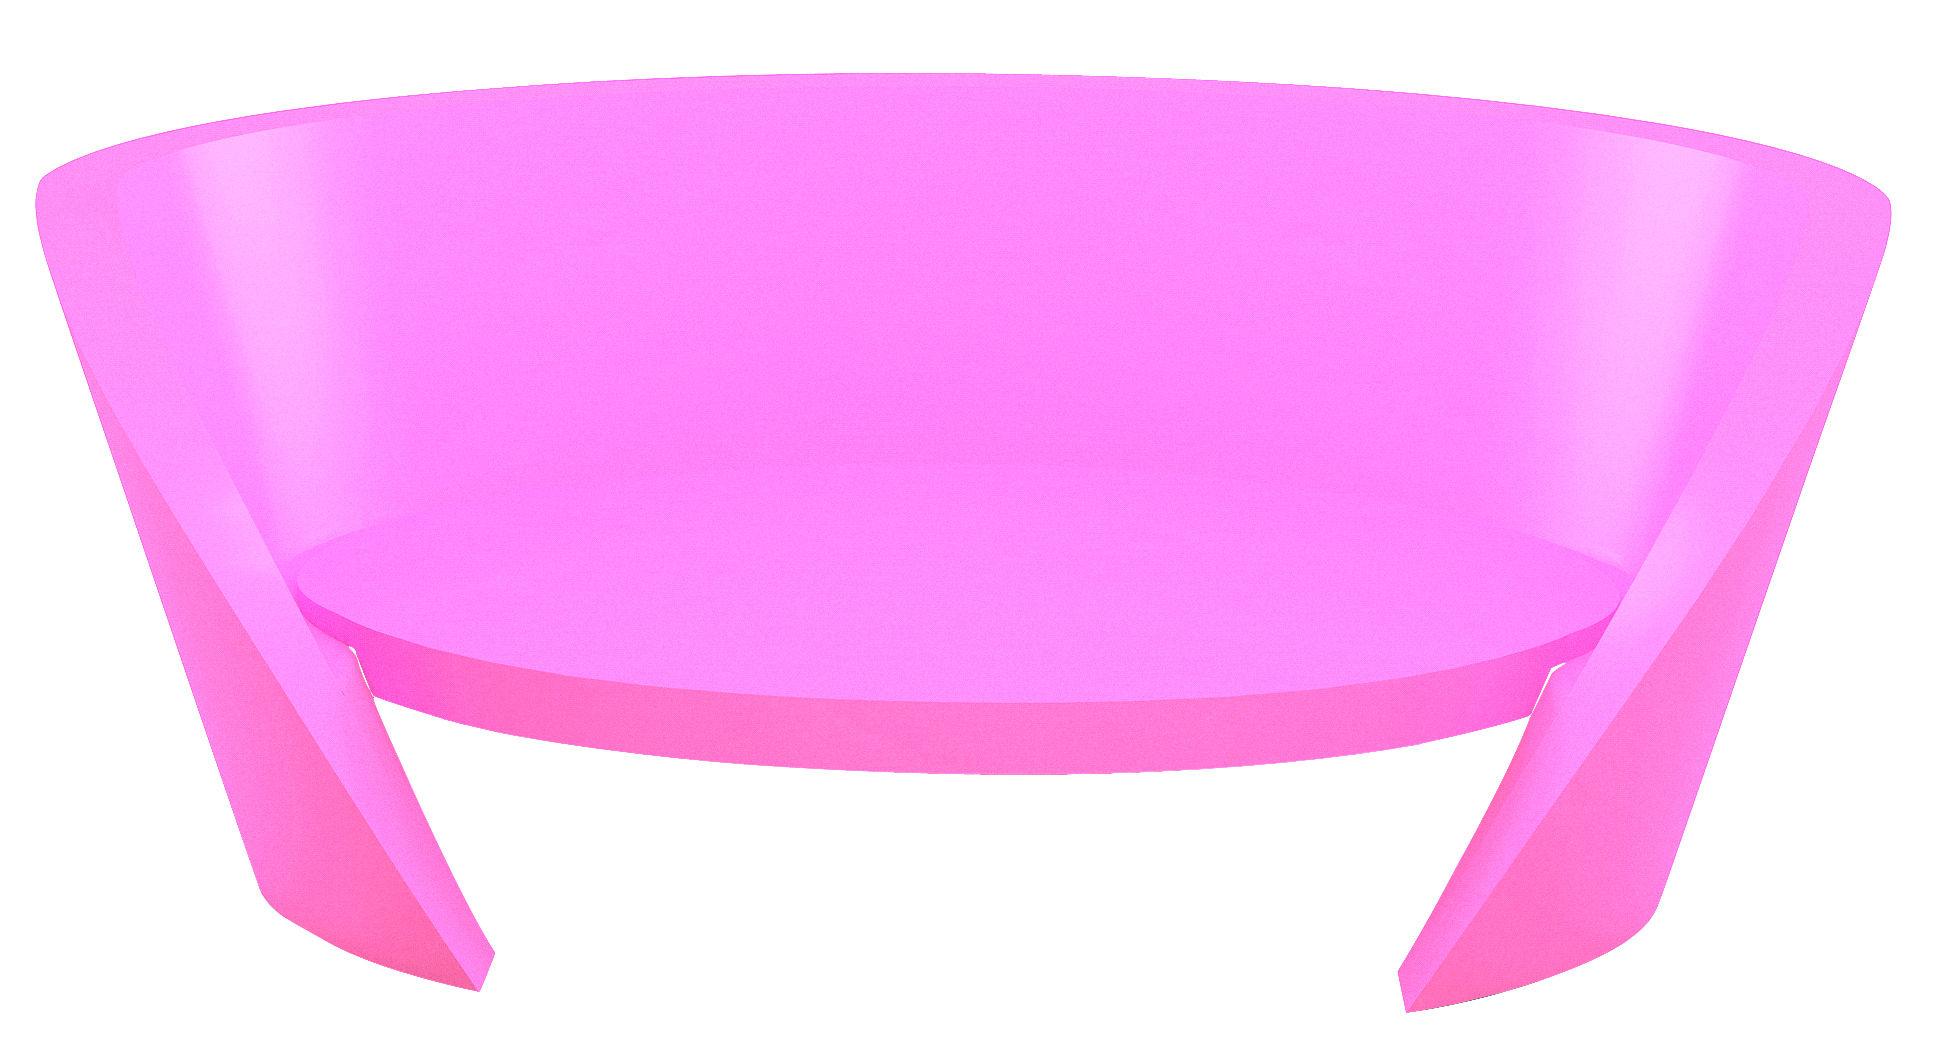 canap rap l 170 cm fuchsia slide. Black Bedroom Furniture Sets. Home Design Ideas